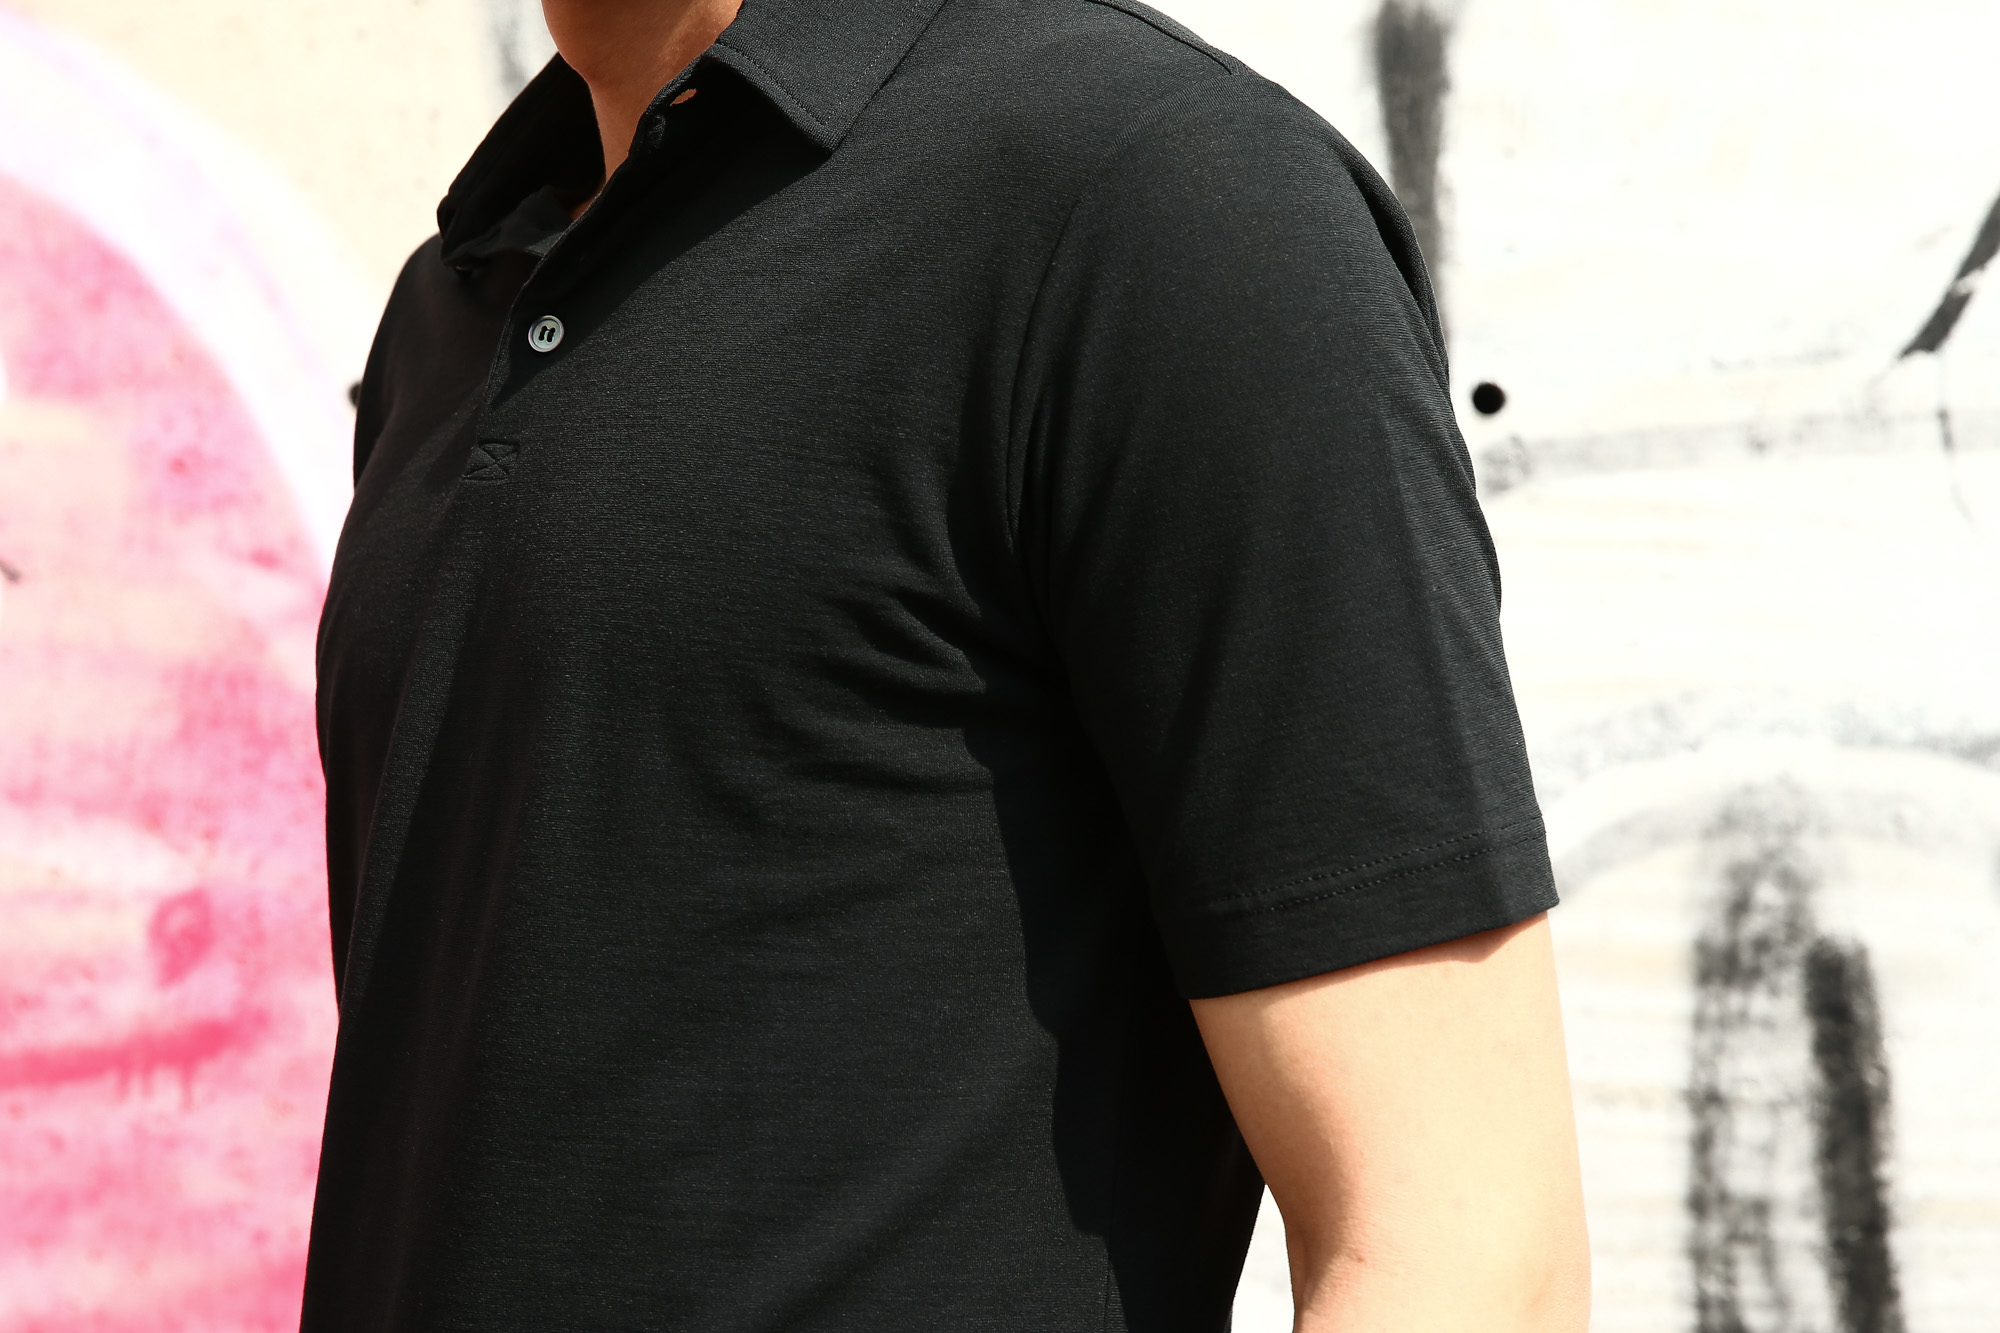 ZANONE (ザノーネ) Polo Shirt ice cotton アイスコットン ポロシャツ BLACK (ブラック・Z0015) made in italy (イタリア製) 2018 春夏新作 愛知 名古屋 ZODIAC ゾディアック ポロ ニットポロ